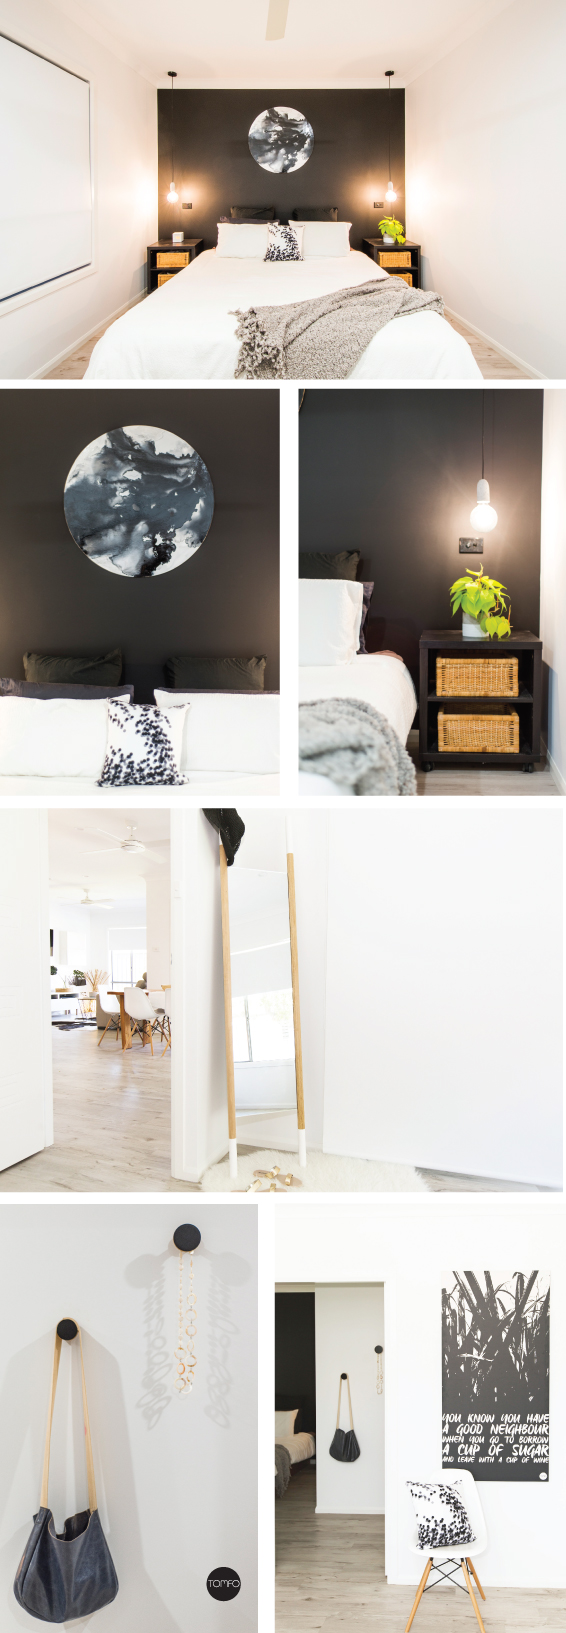 MBA-AWARD-bedroom-Tomfo